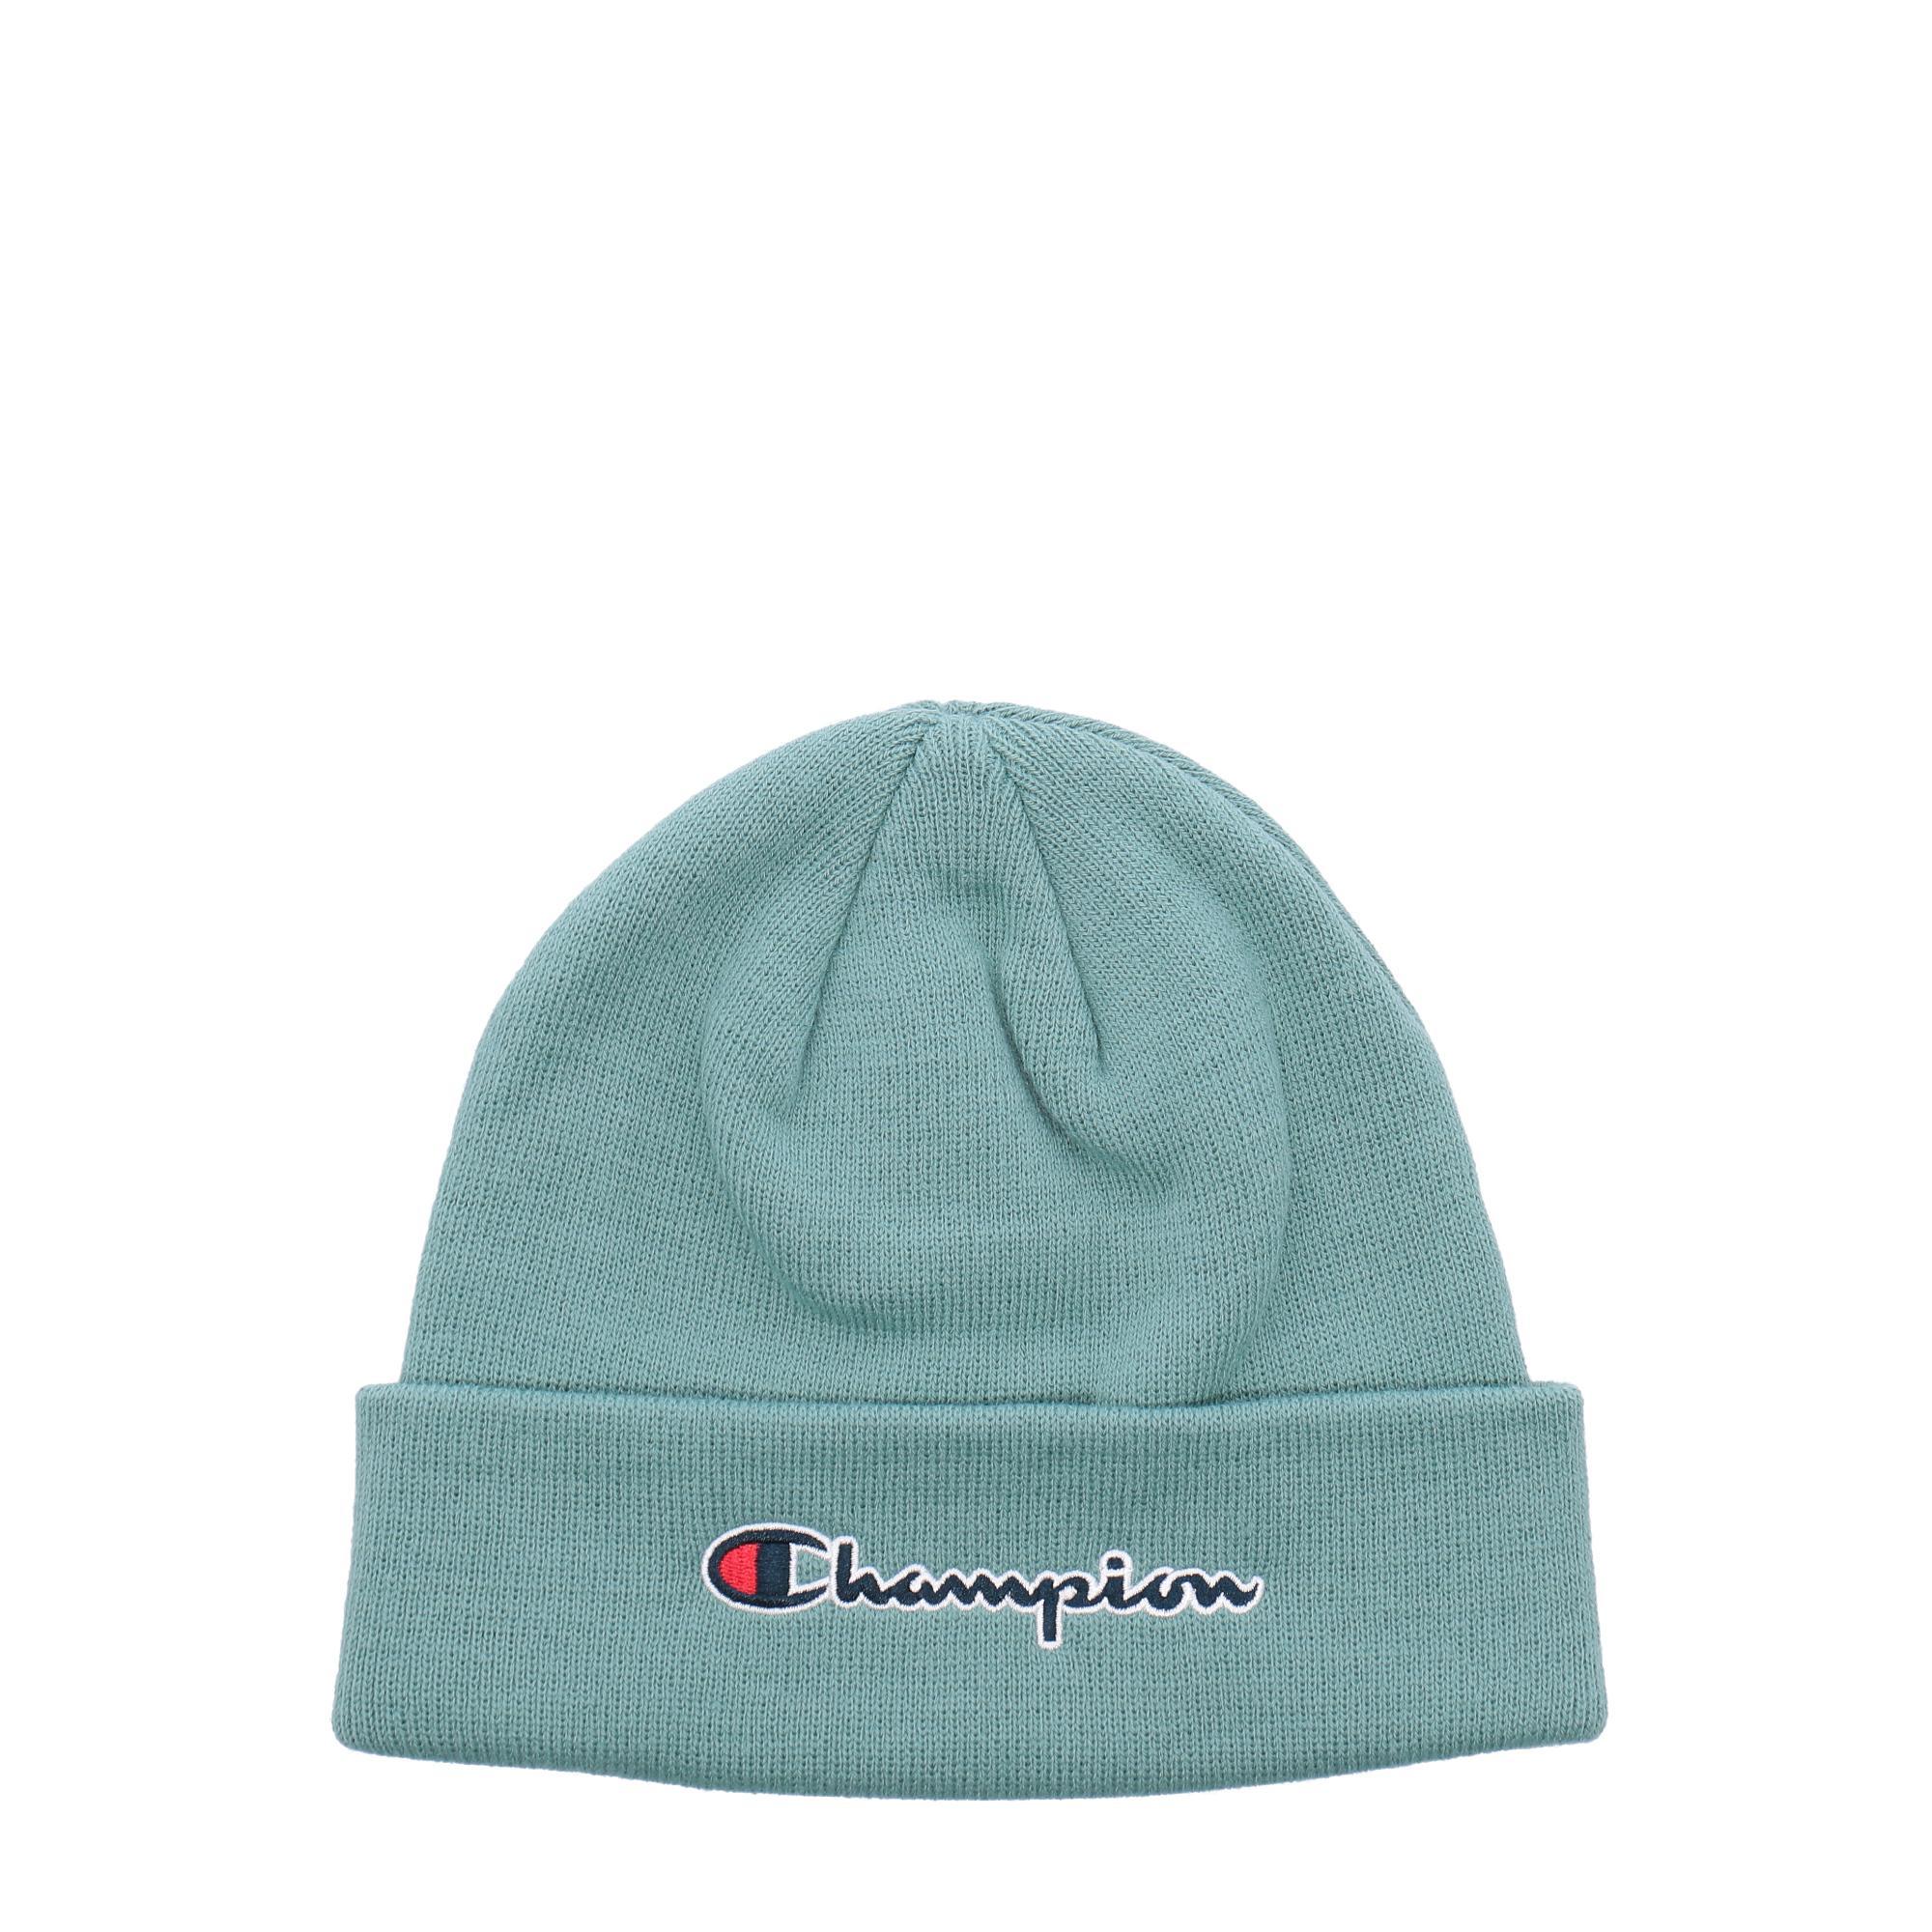 Champion Beanie Cap Green pastel